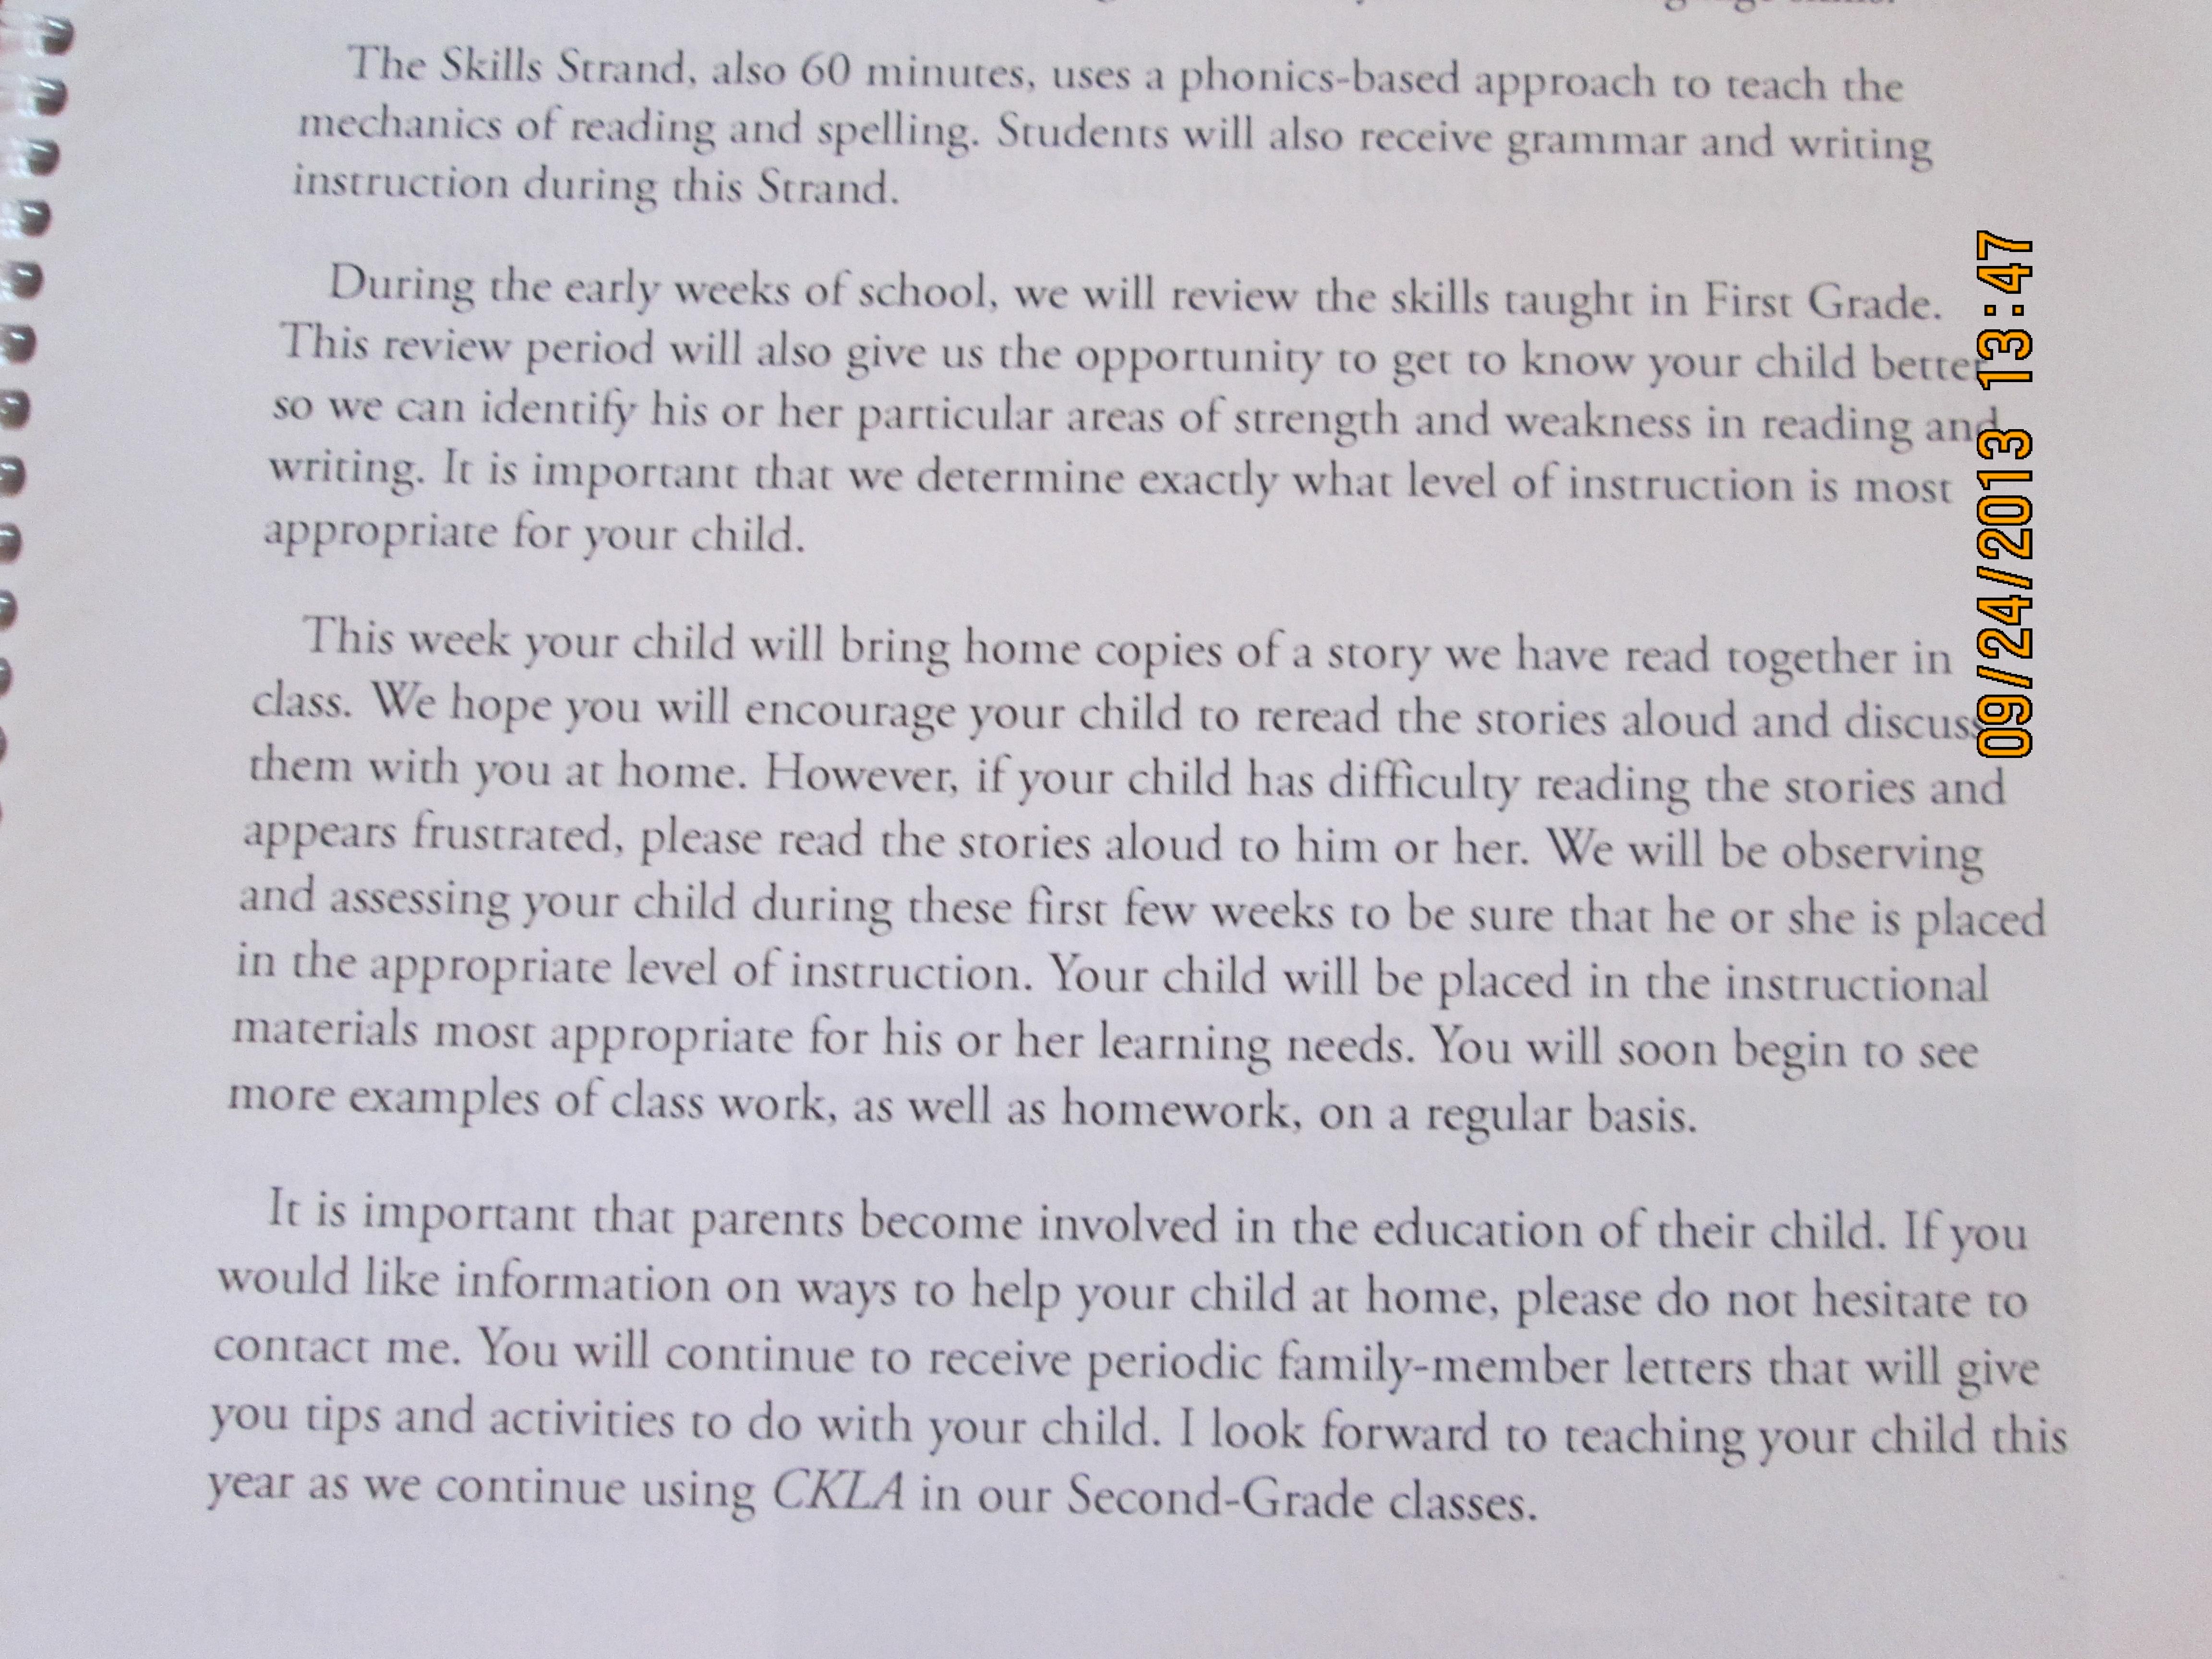 Second Grade Skills Strand Lesson 1 Thanks Engageny